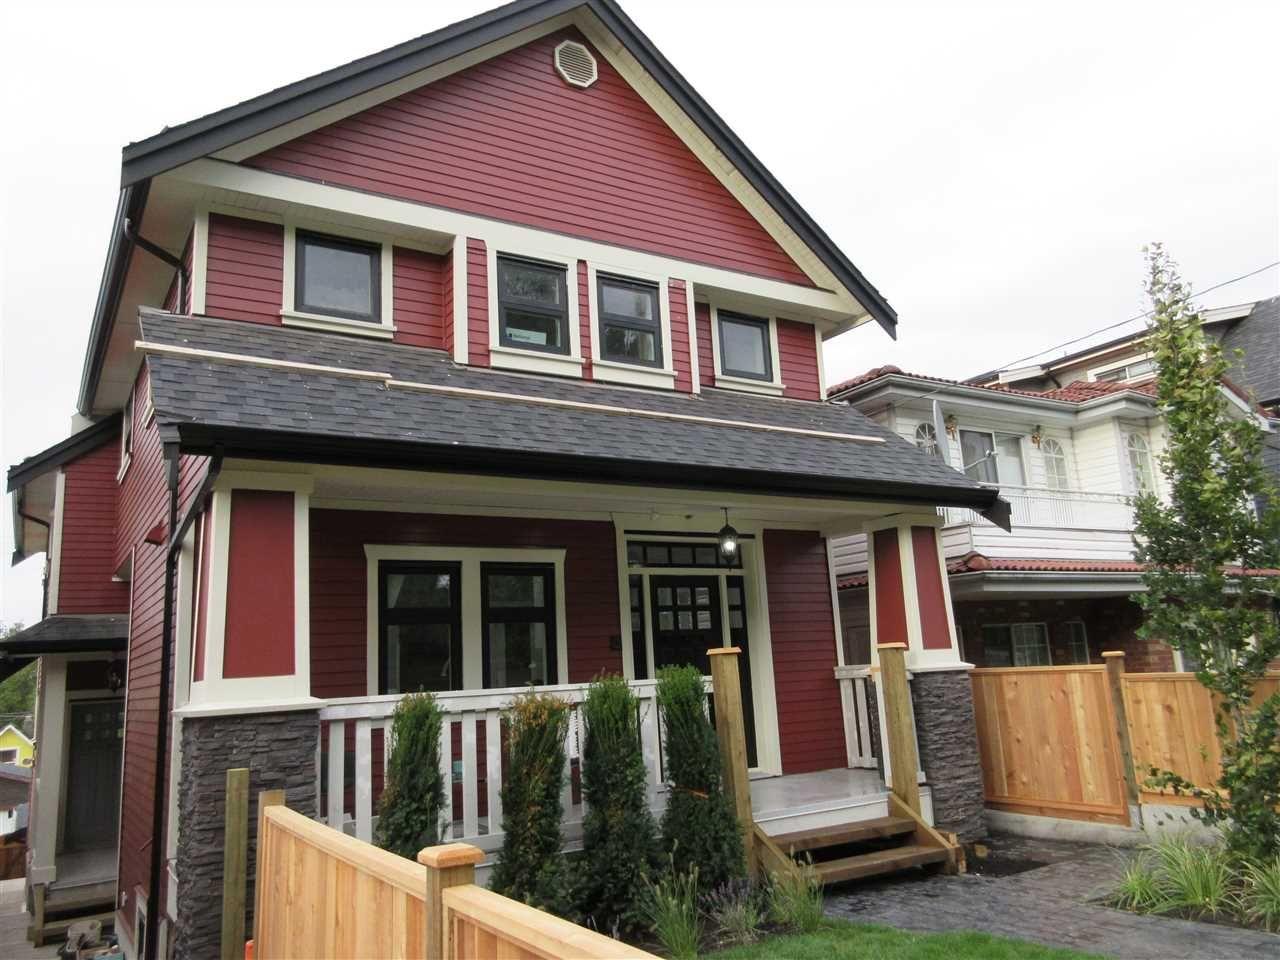 Main Photo: 1645 E 14TH AVENUE in : Grandview VE 1/2 Duplex for sale : MLS®# R2126747